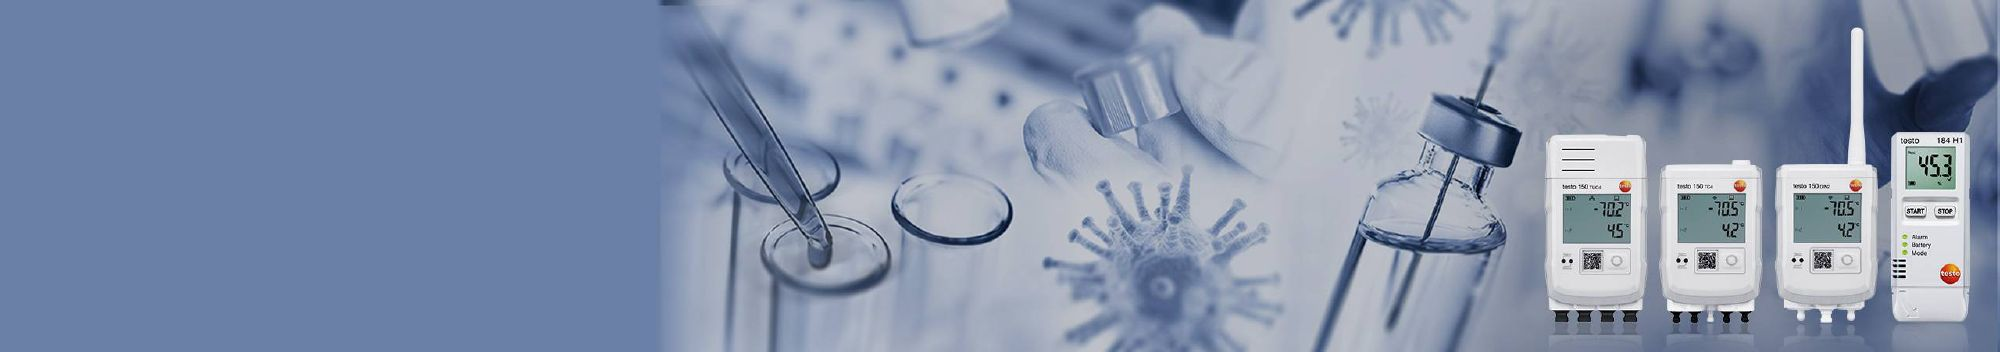 <b>COVID-19 Impfstoffe</b> schützen: